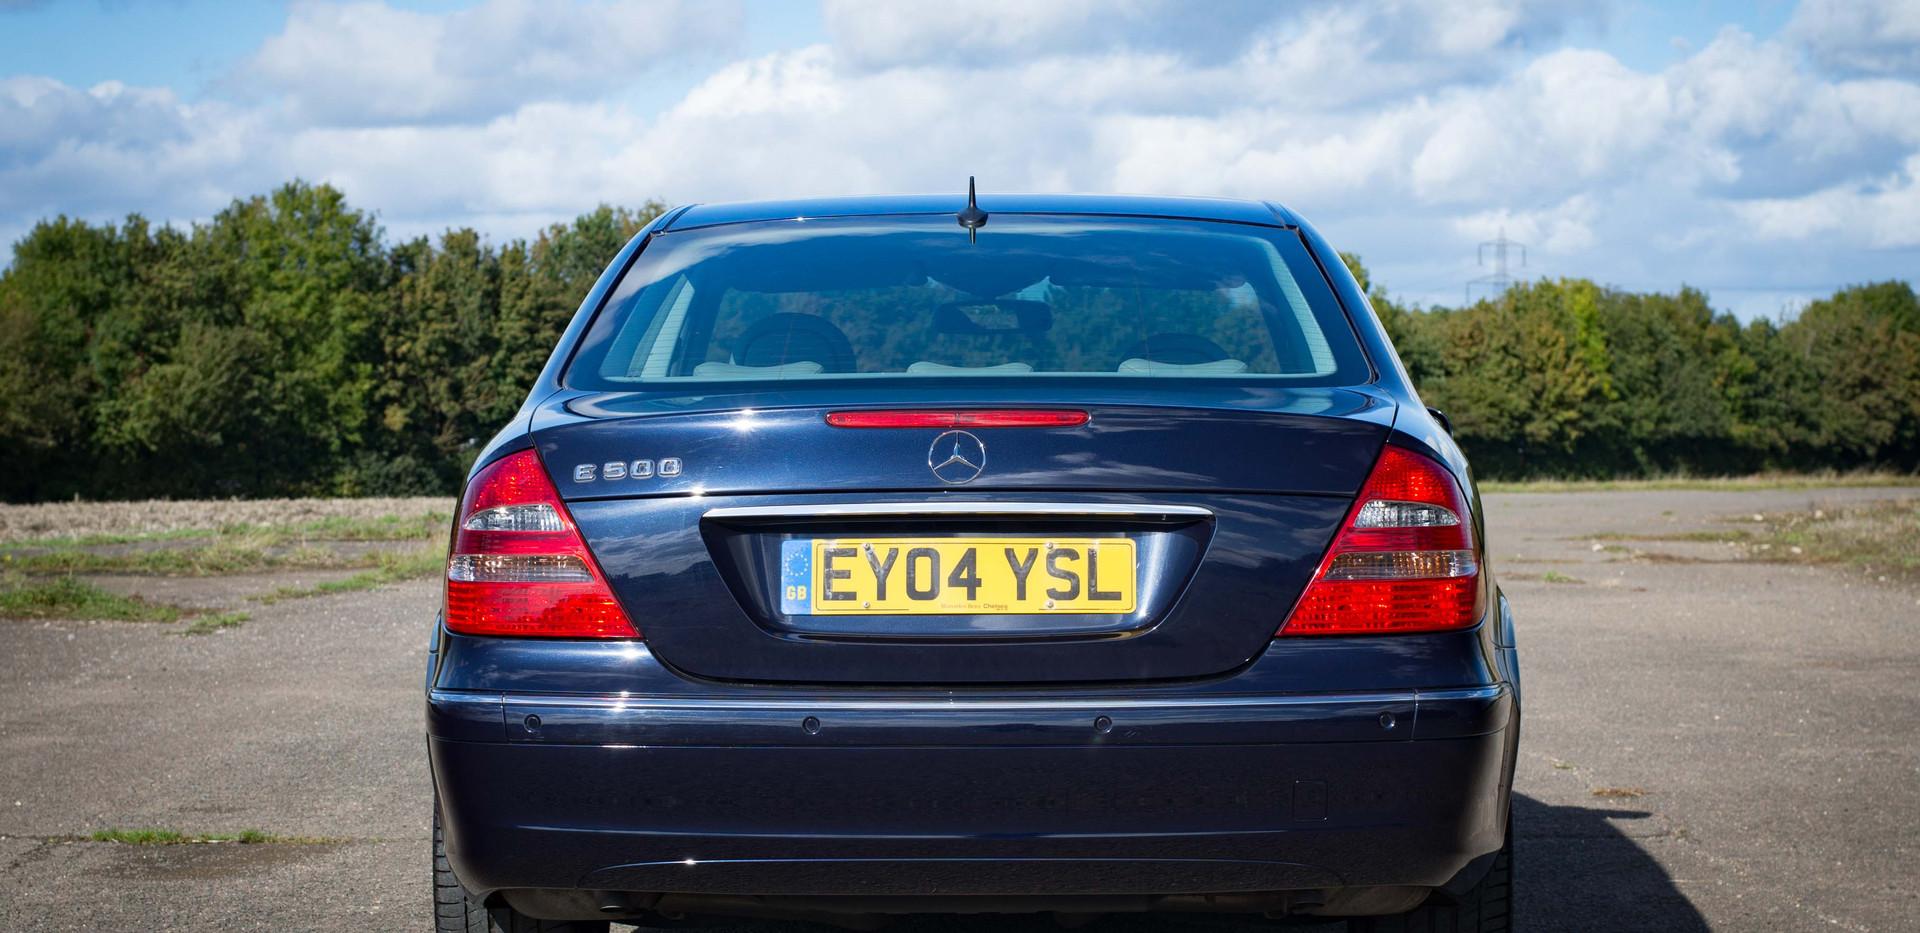 Mercedes E500 For Sale UK London  (3 of